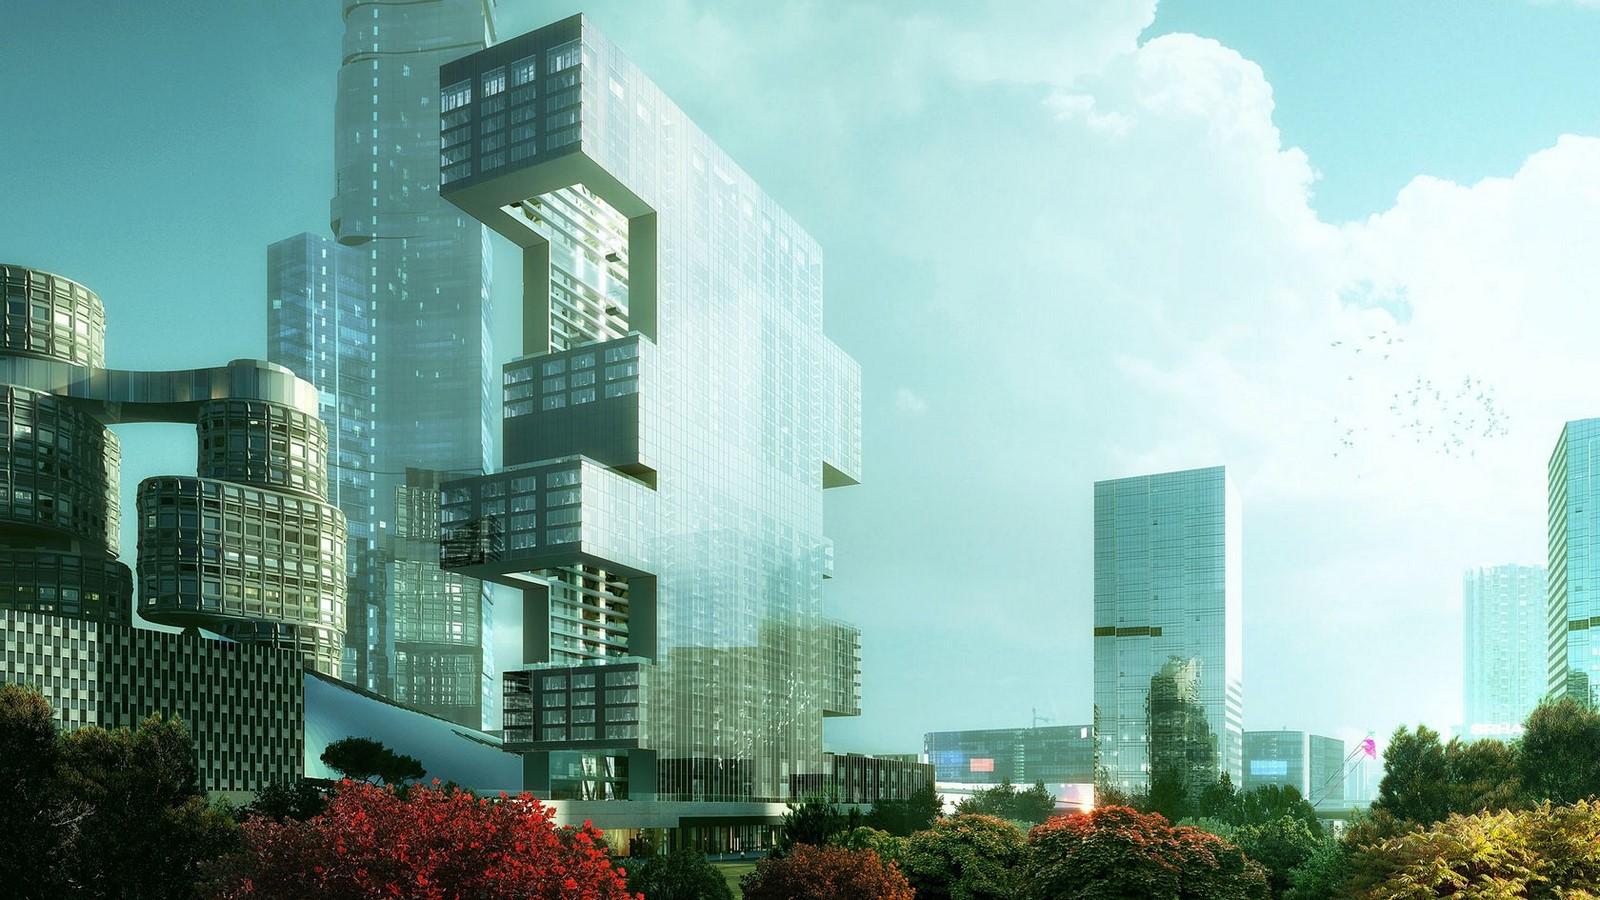 Sculpting a Futuristic Utopia of Architecture? Sheet2